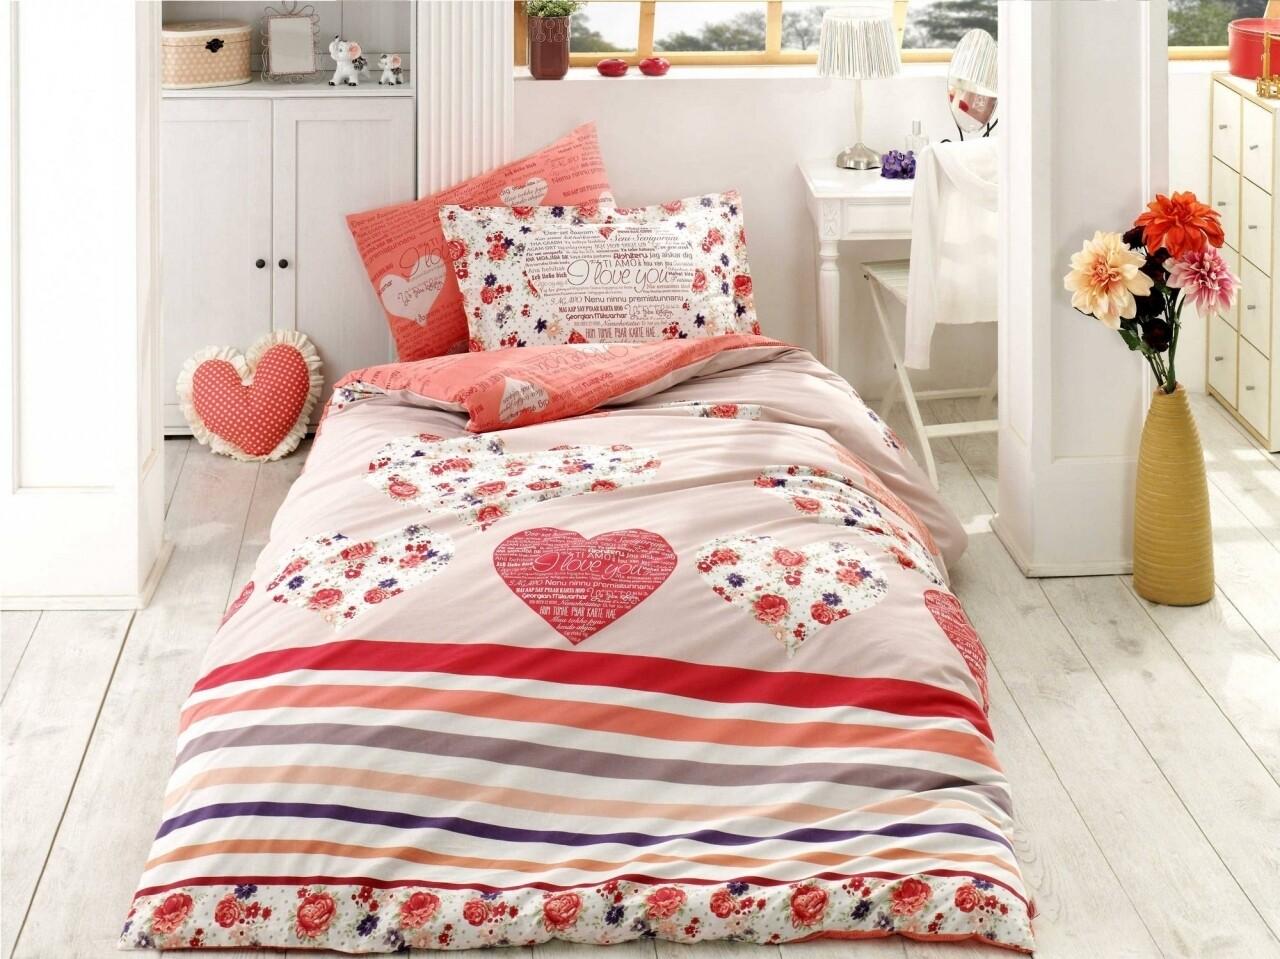 Lenjerie de pat pentru o persoana, 3 piese, 100% bumbac poplin, Hobby, Bella, rosu